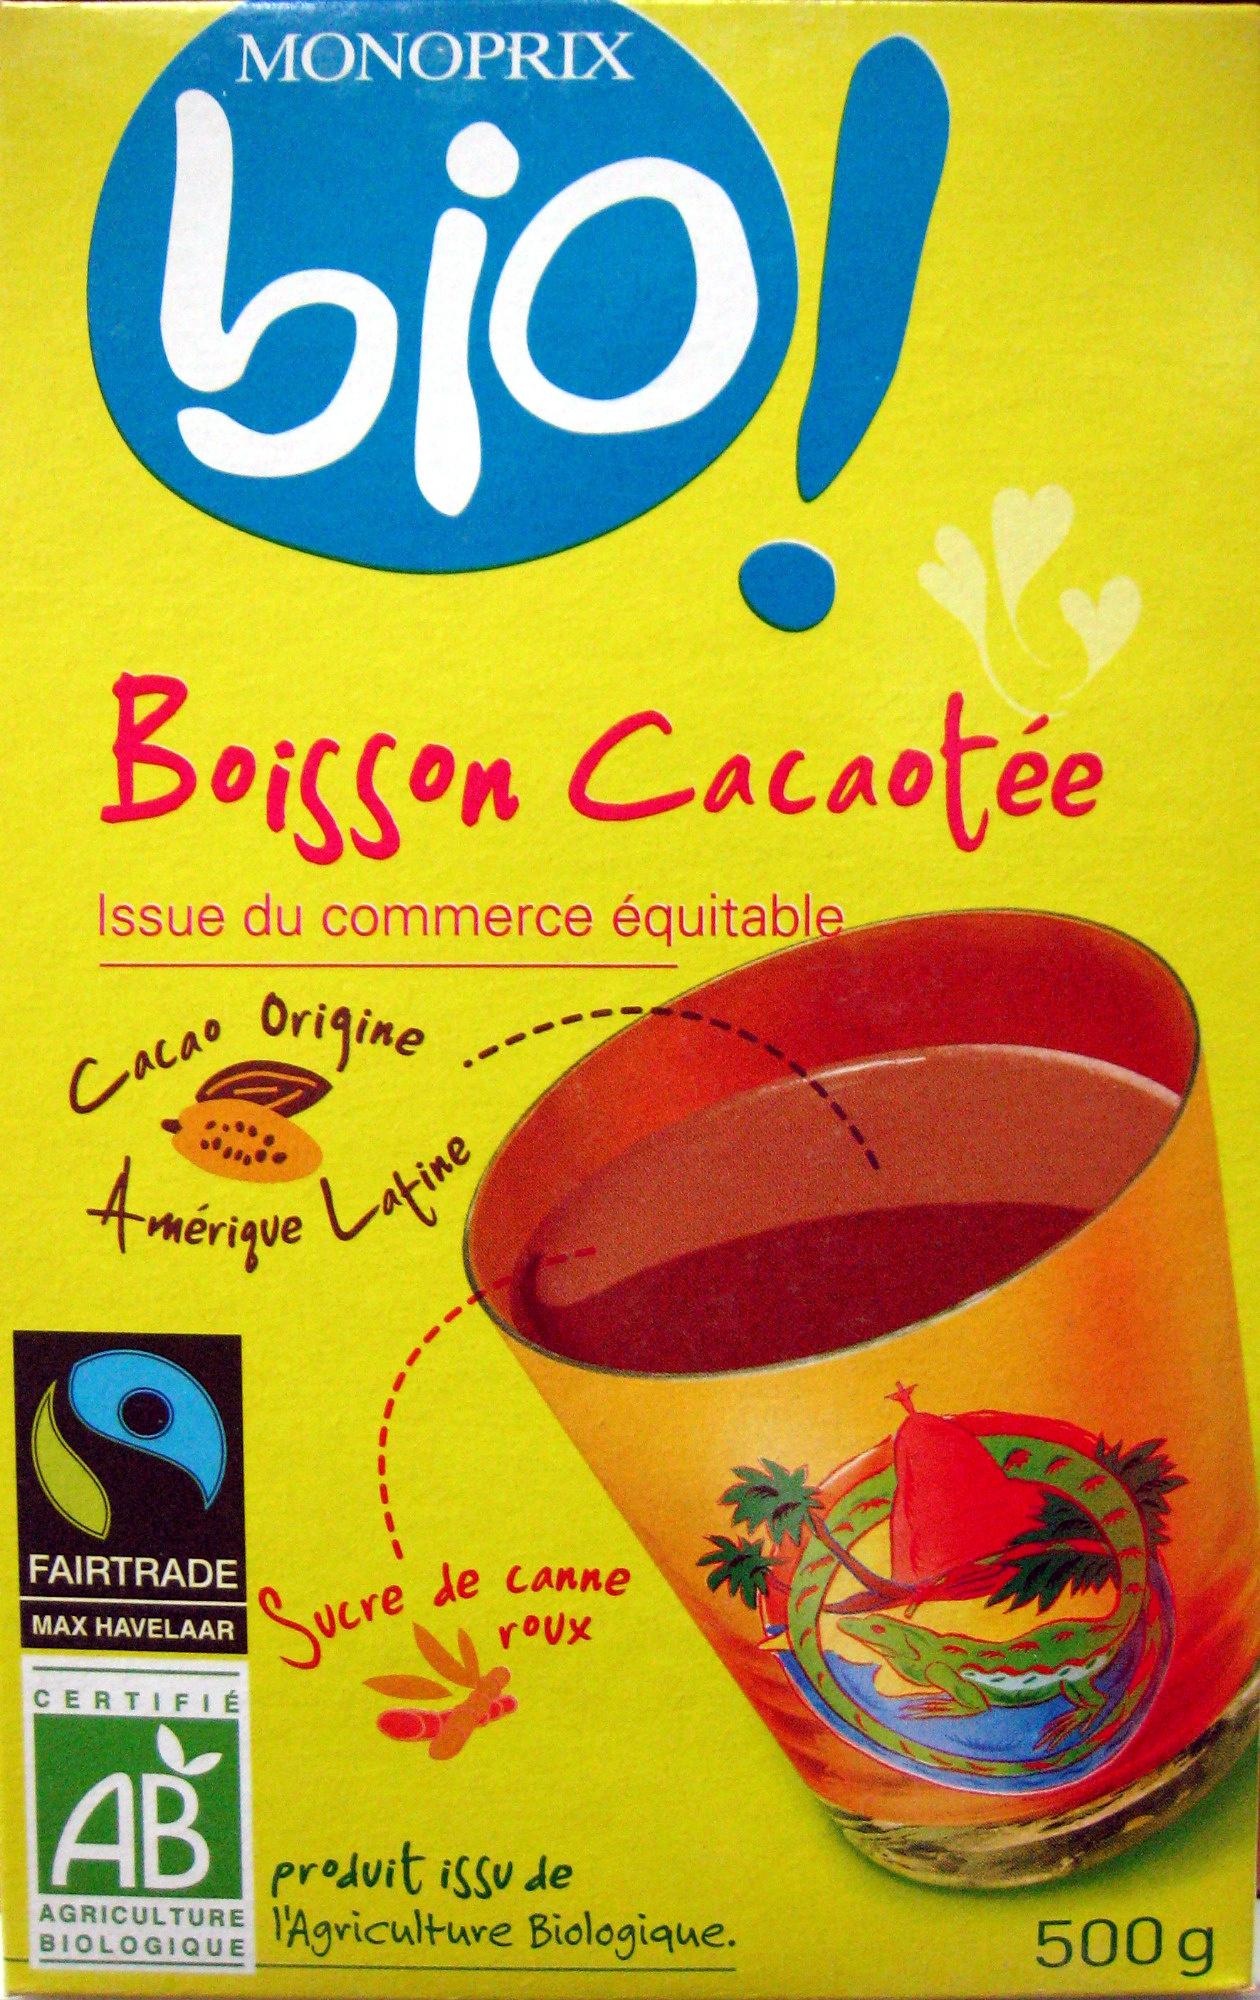 Boisson cacaotée - Product